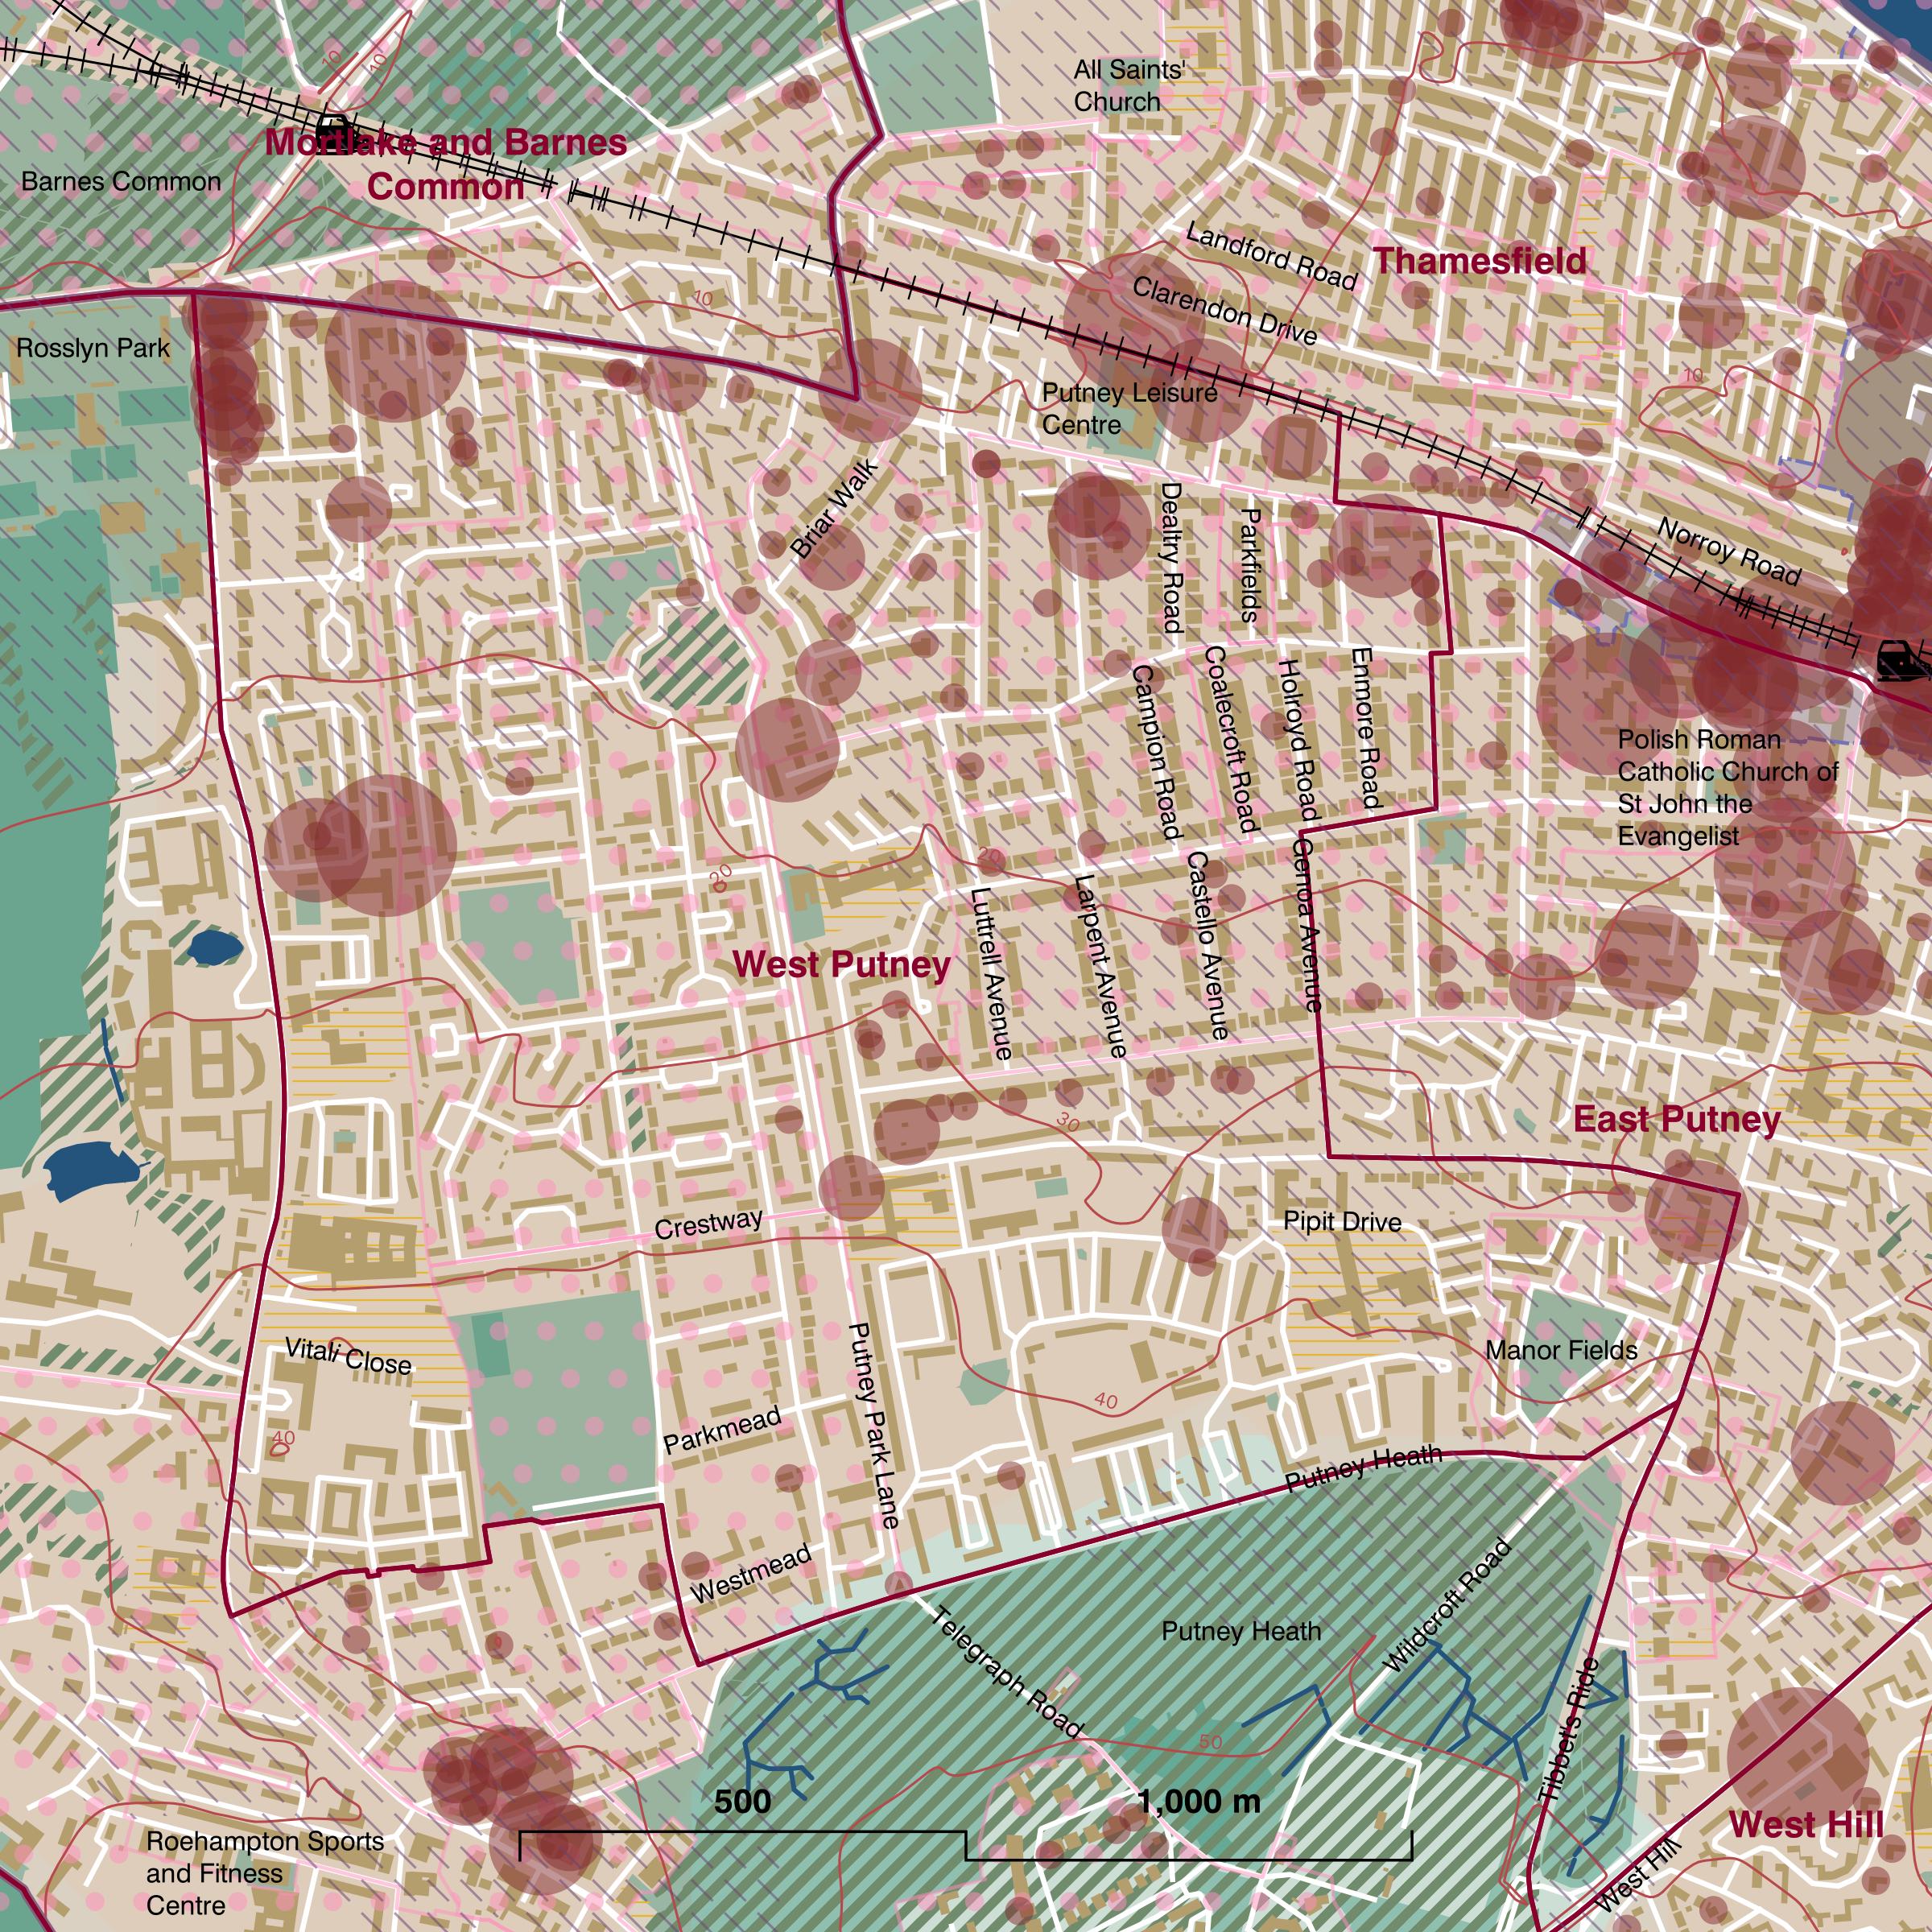 Map of West Putney ward